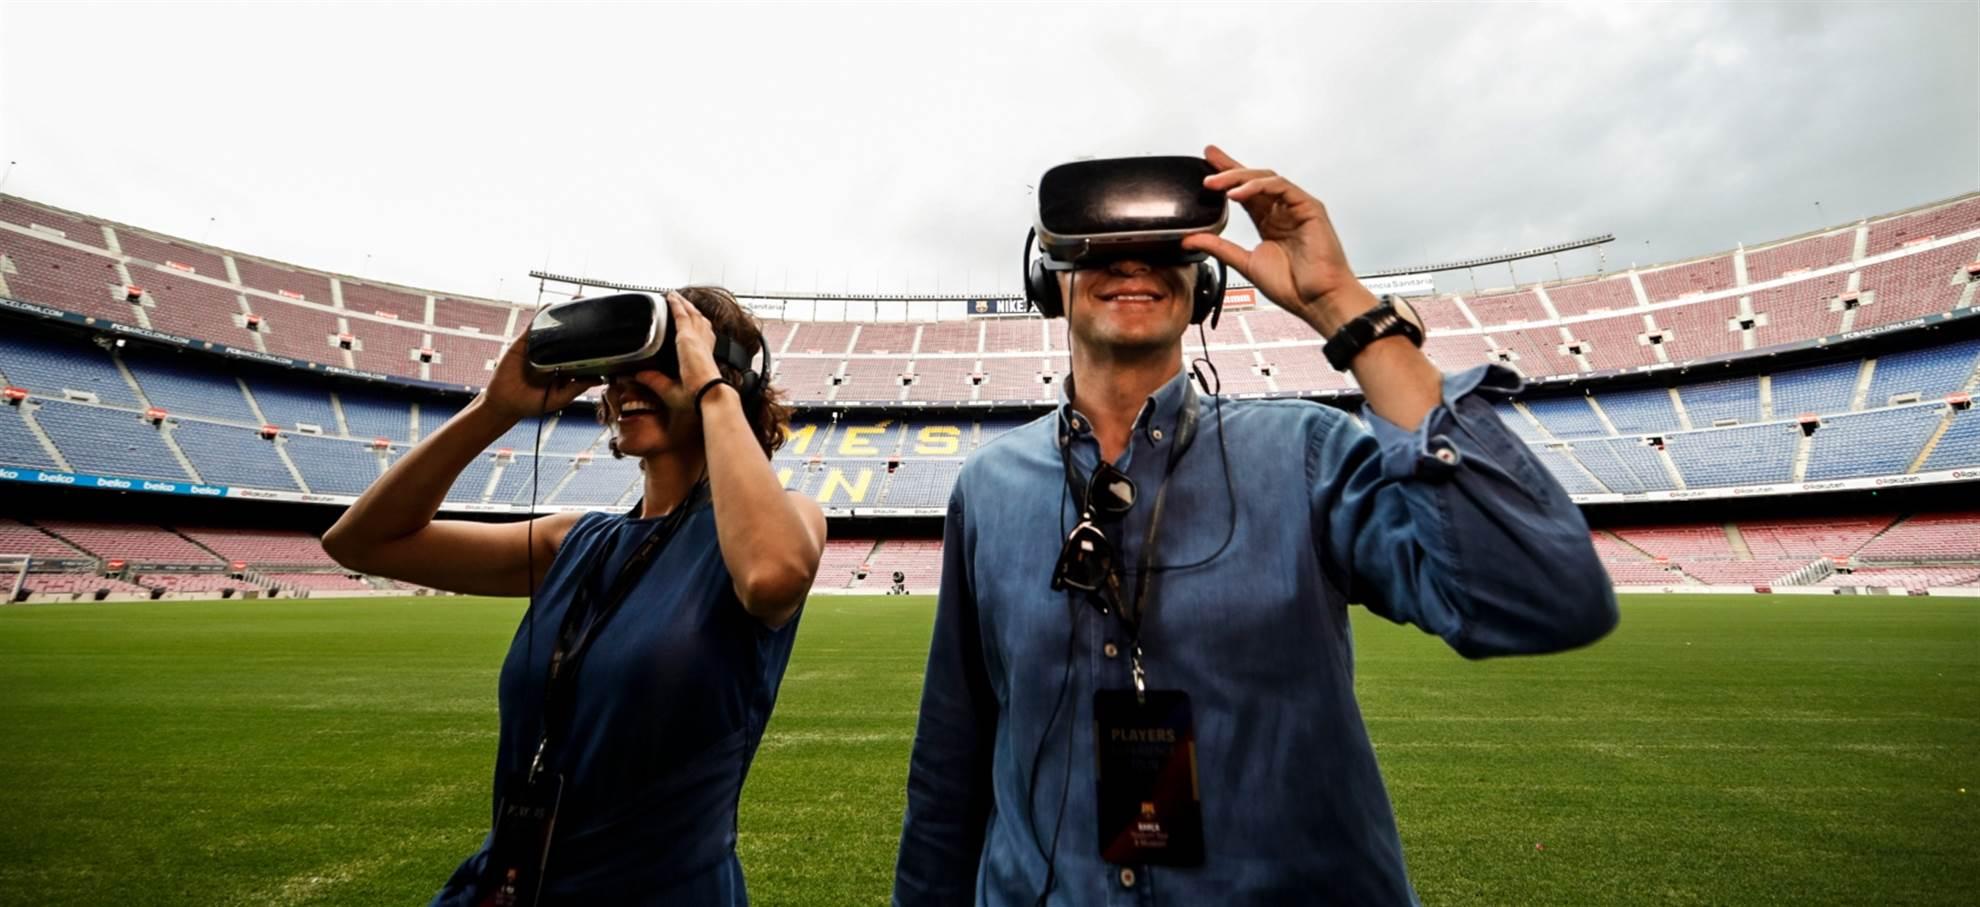 Players Experience Tour (inclusief bezoek kleedkamer Barca)